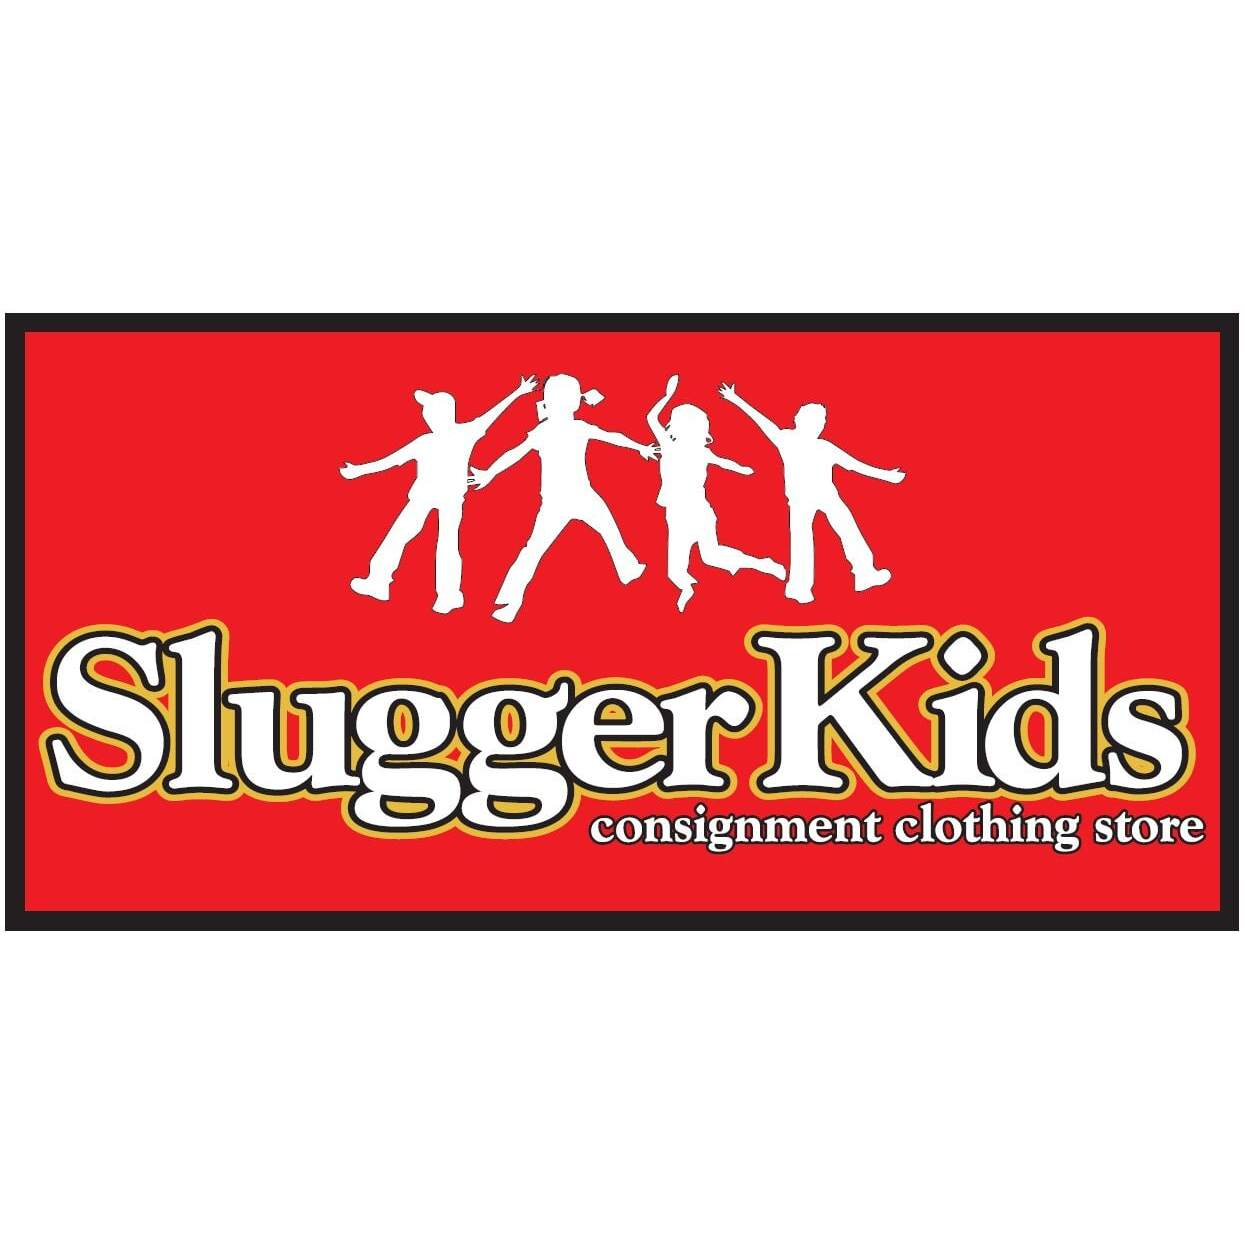 SluggerKids Consignment - Louisville, KY - Art & Antique Stores, Restoration